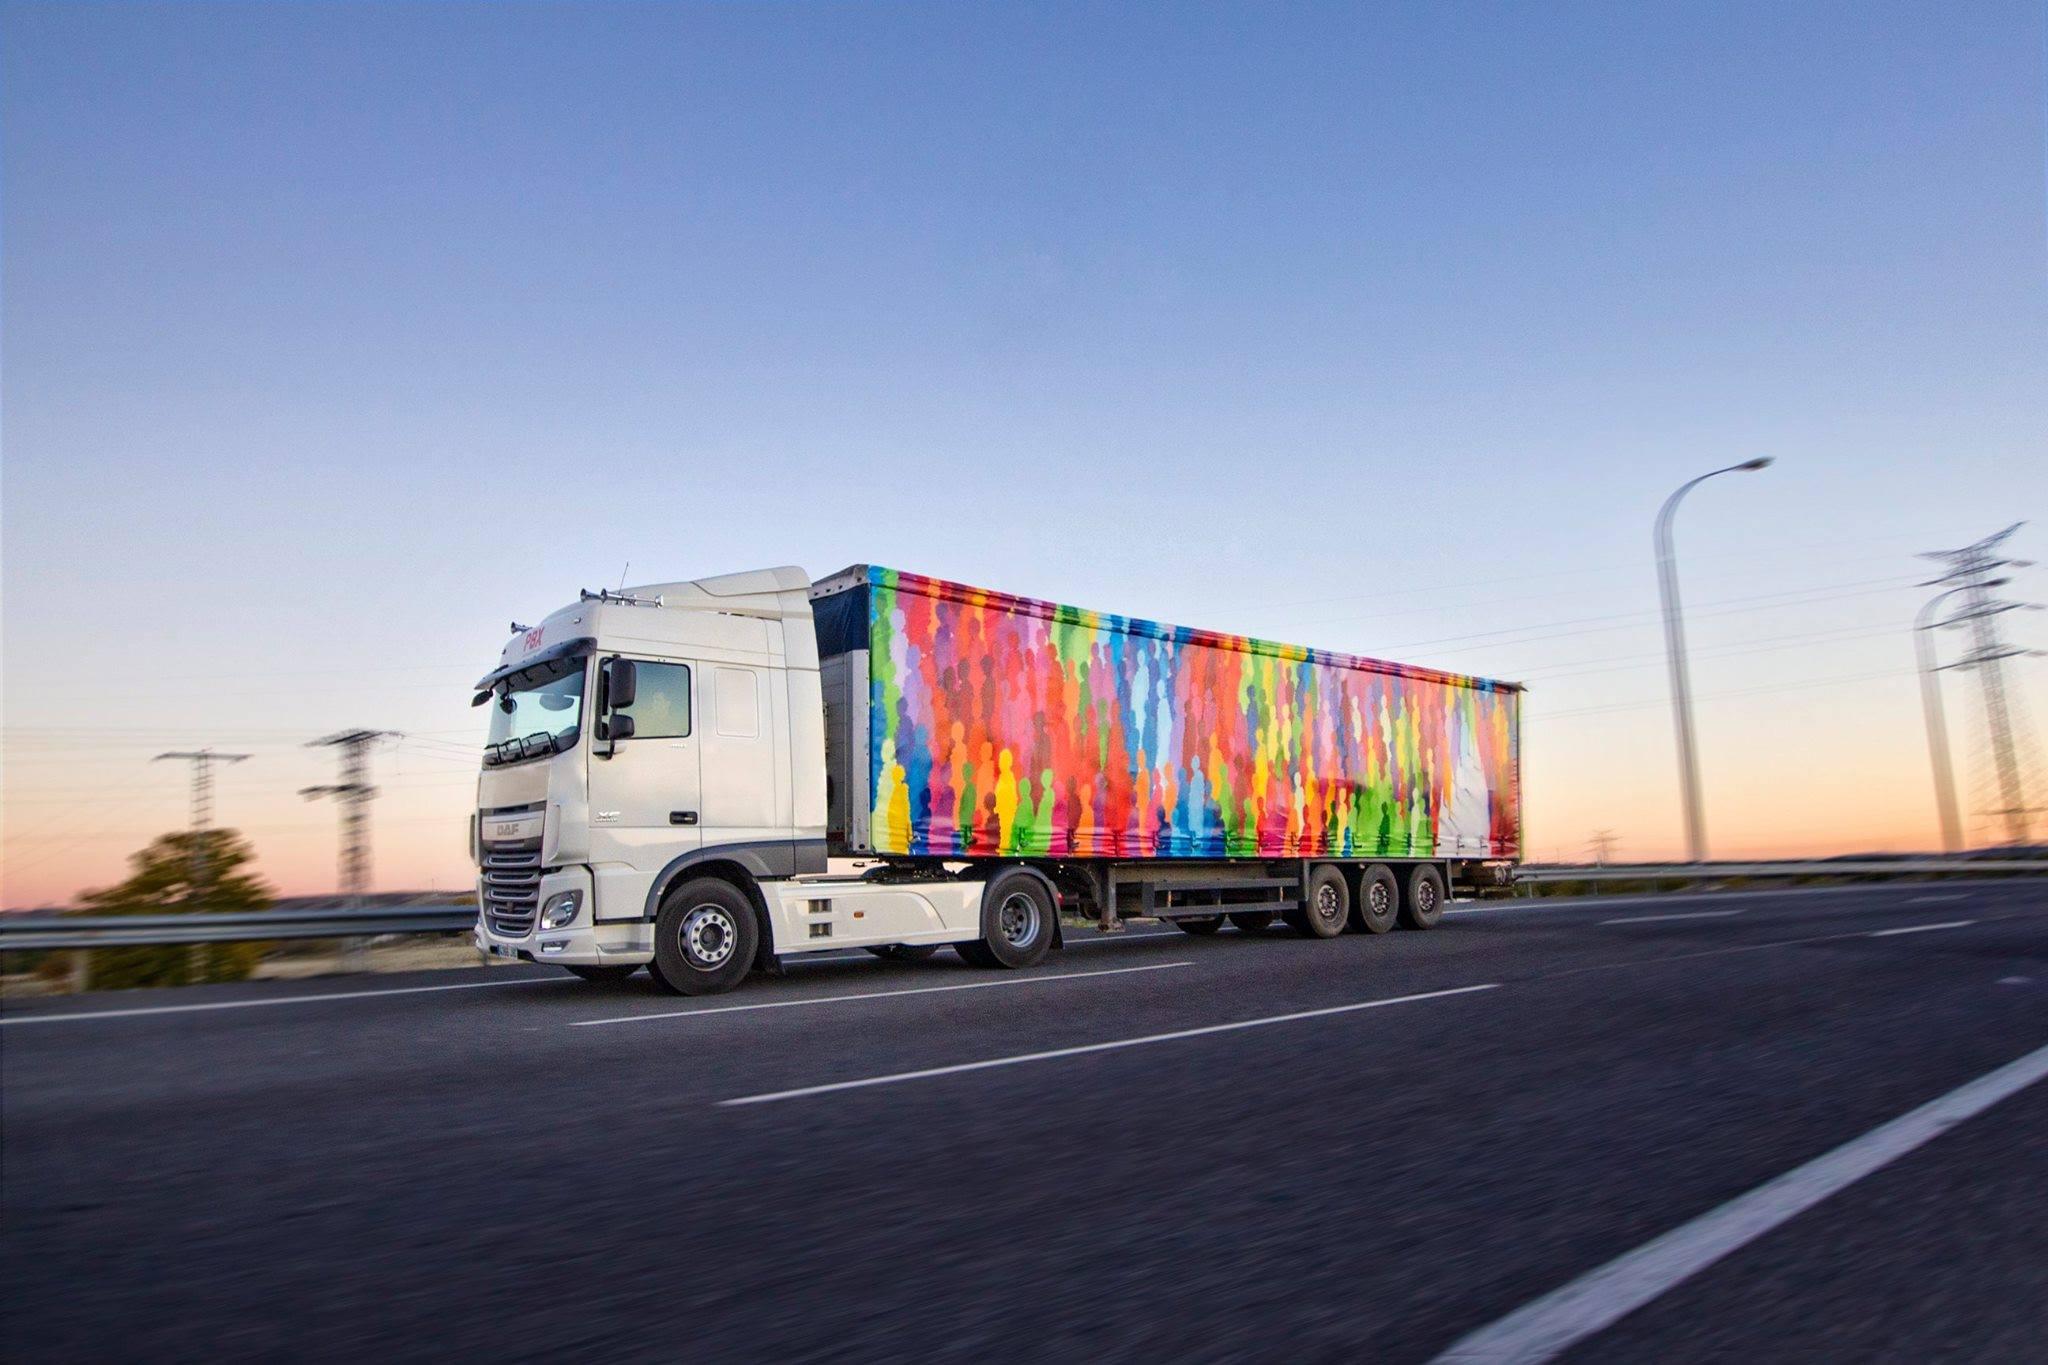 Truck Art Project - 001